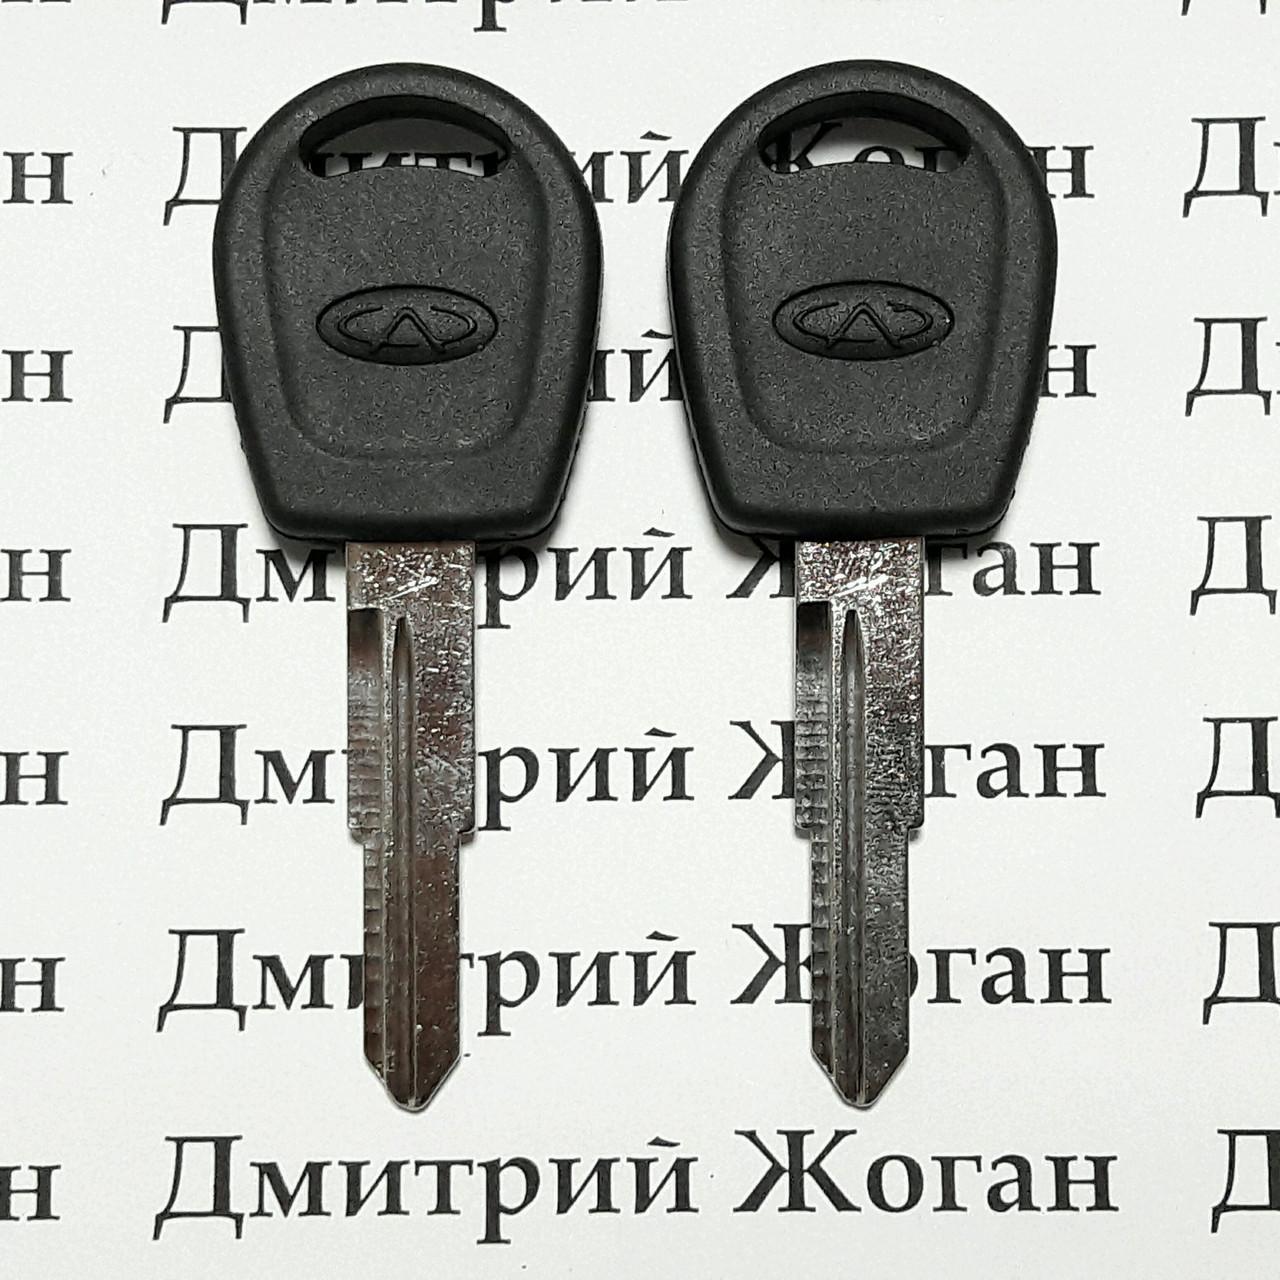 "Корпус авто ключа под чип для Chery (Чери) тип - 1 - Магазин ключей - ""Key-shop"" в Кривом Роге"